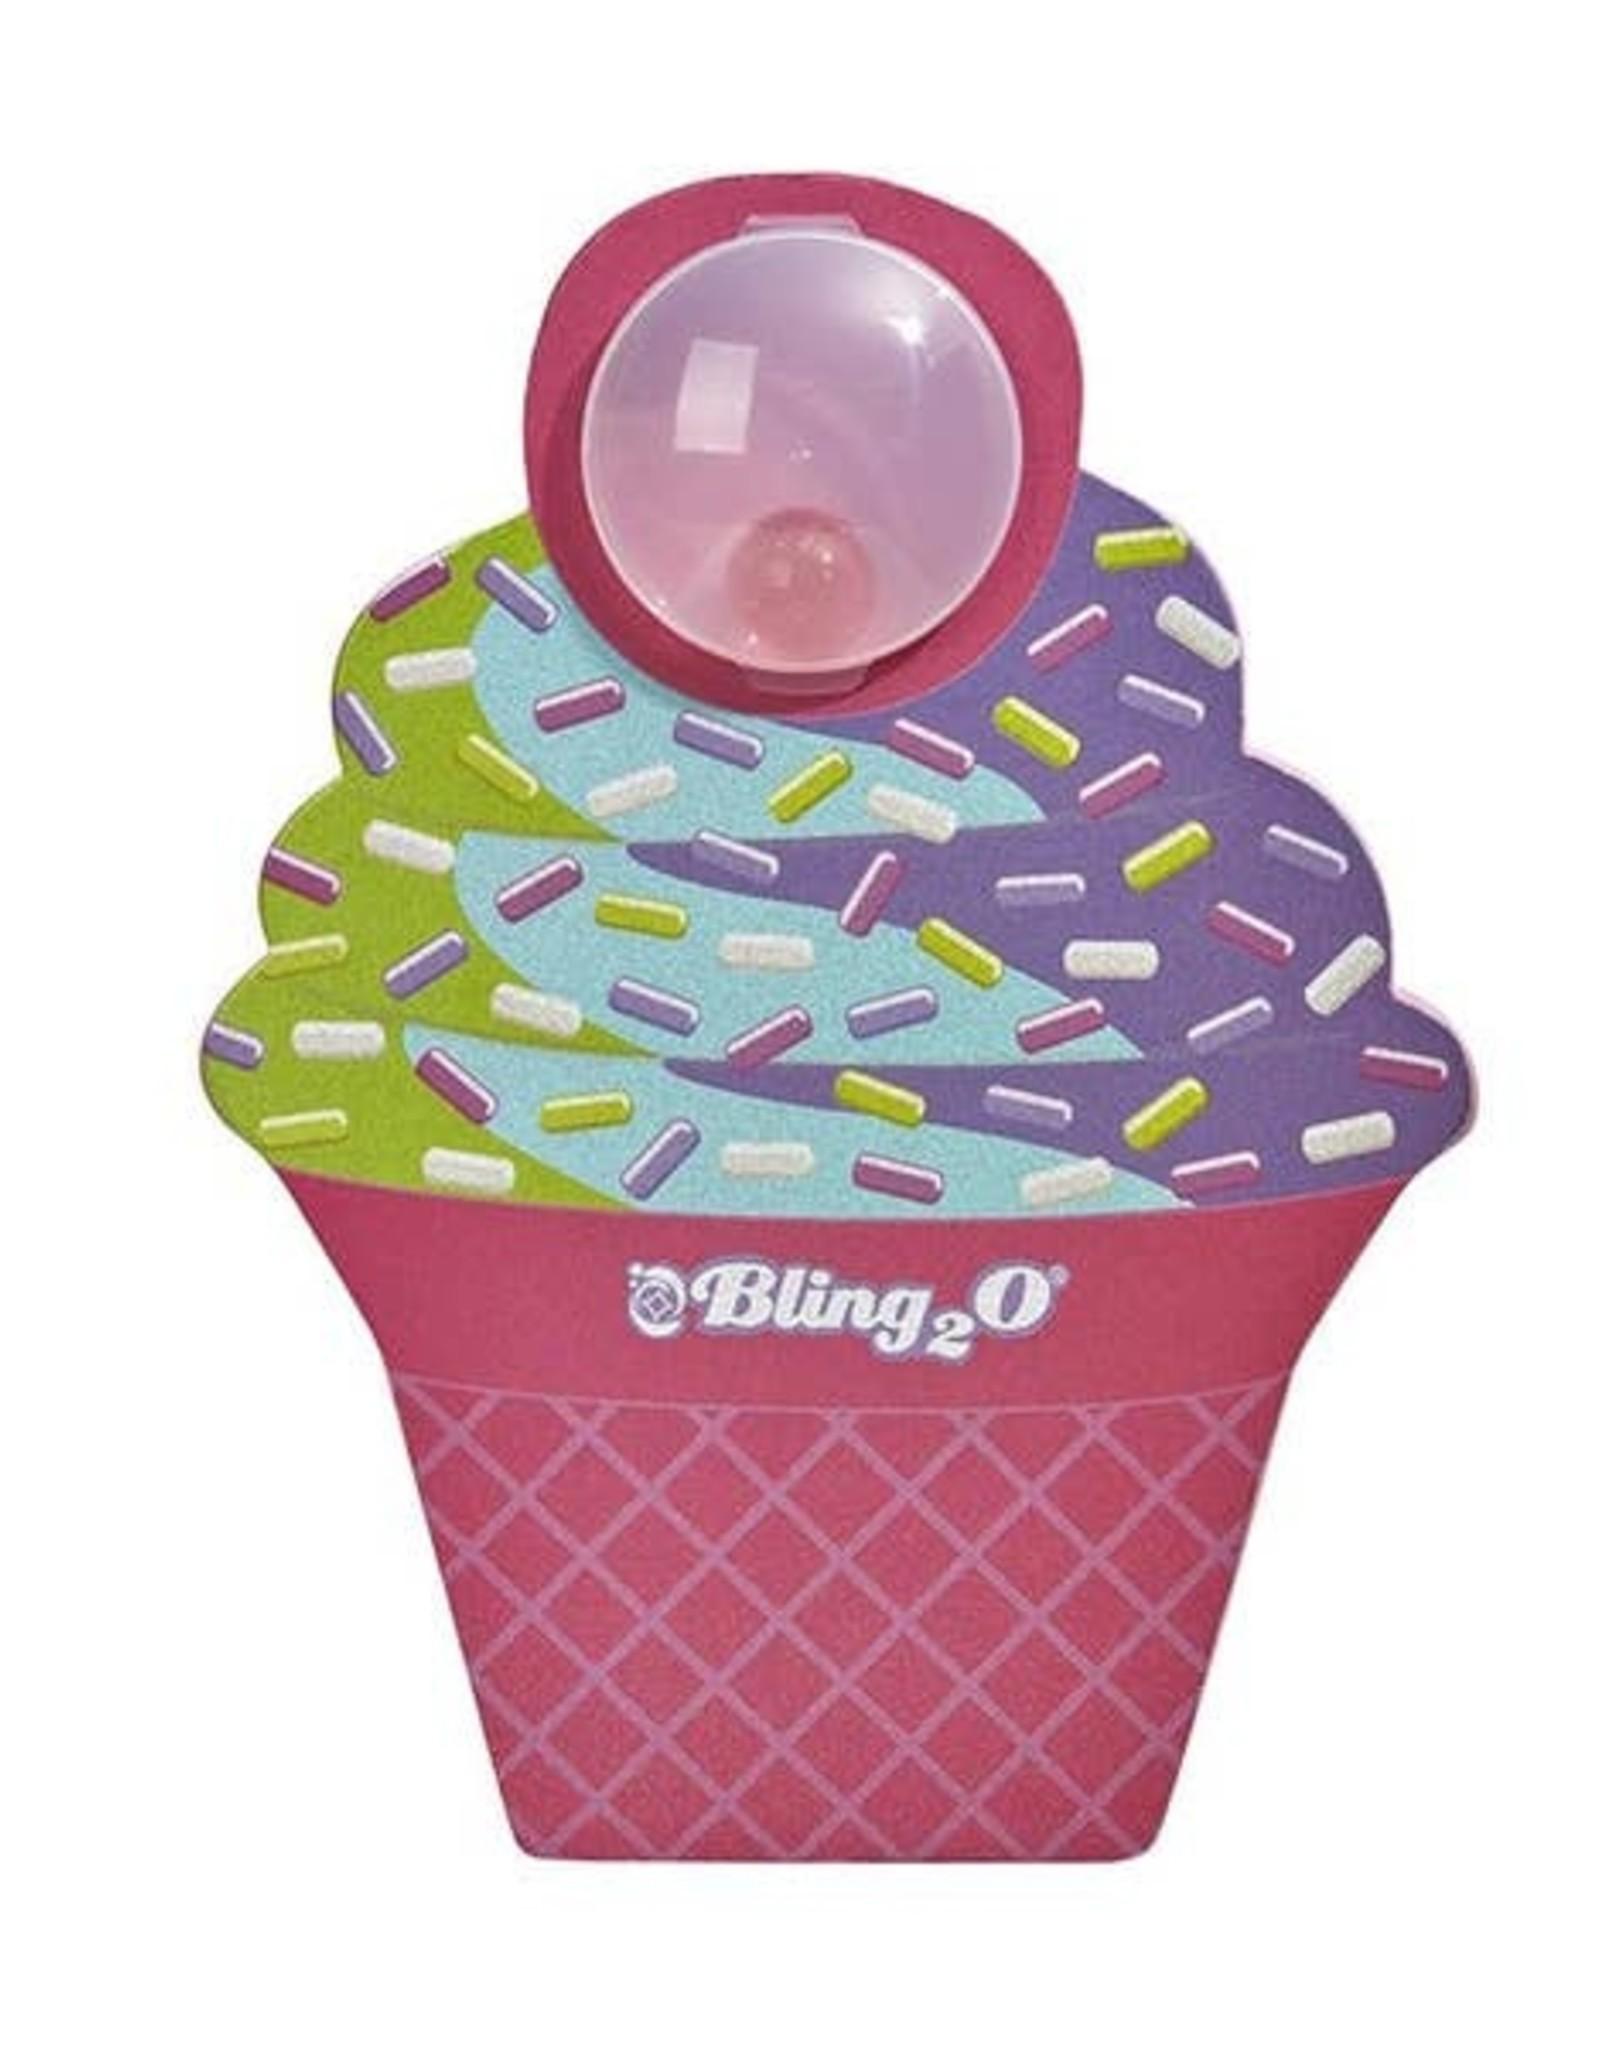 Bling2o Cherry On Top Kickboard